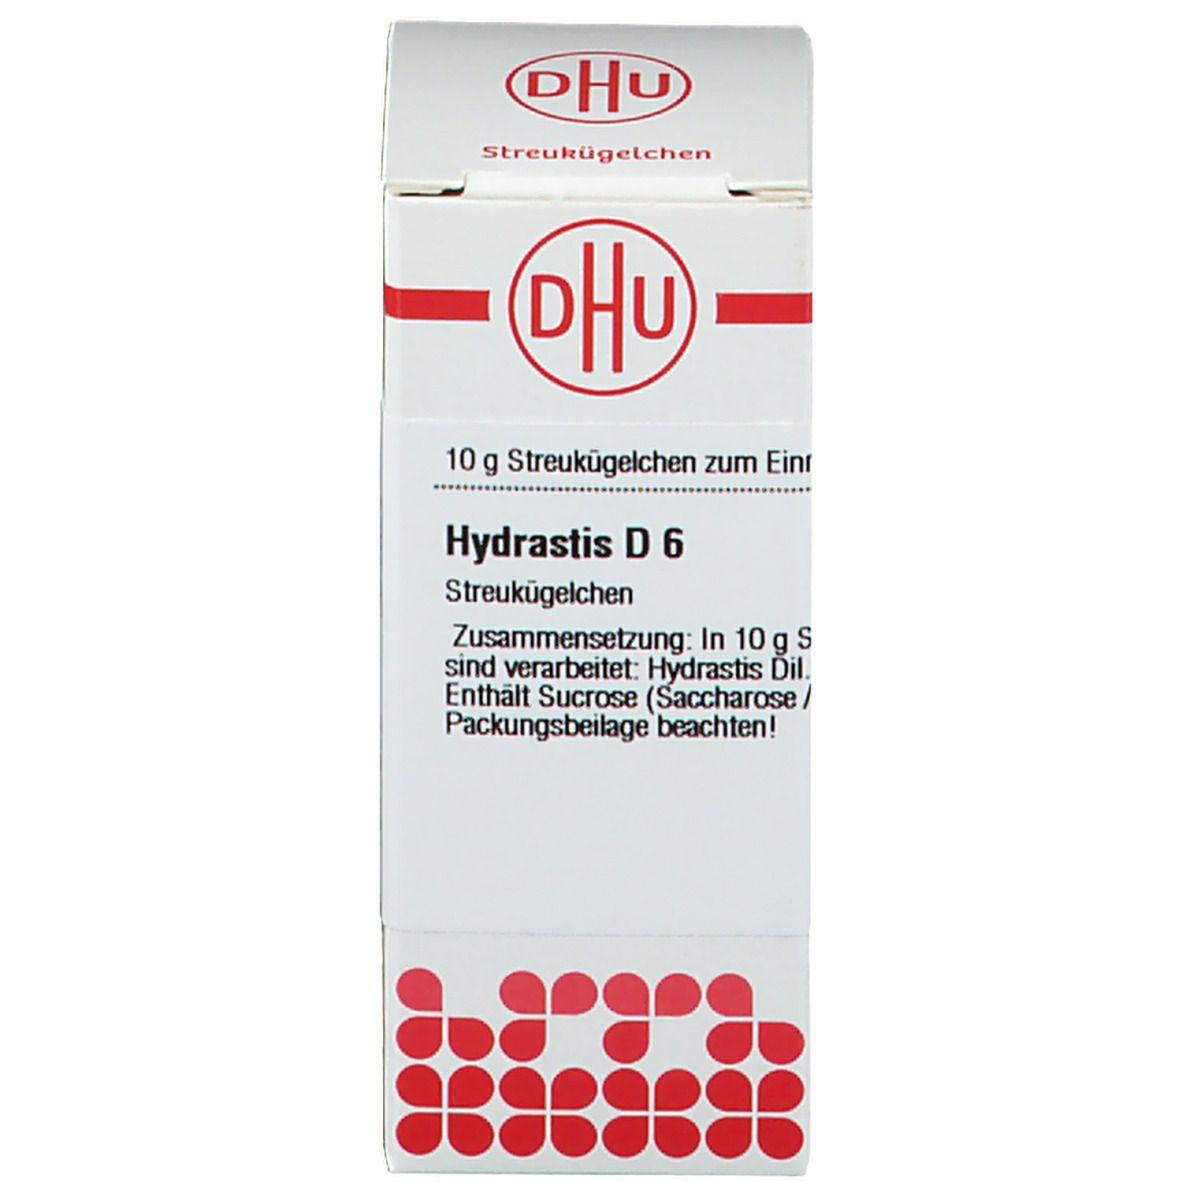 DHU Hydrastis D6